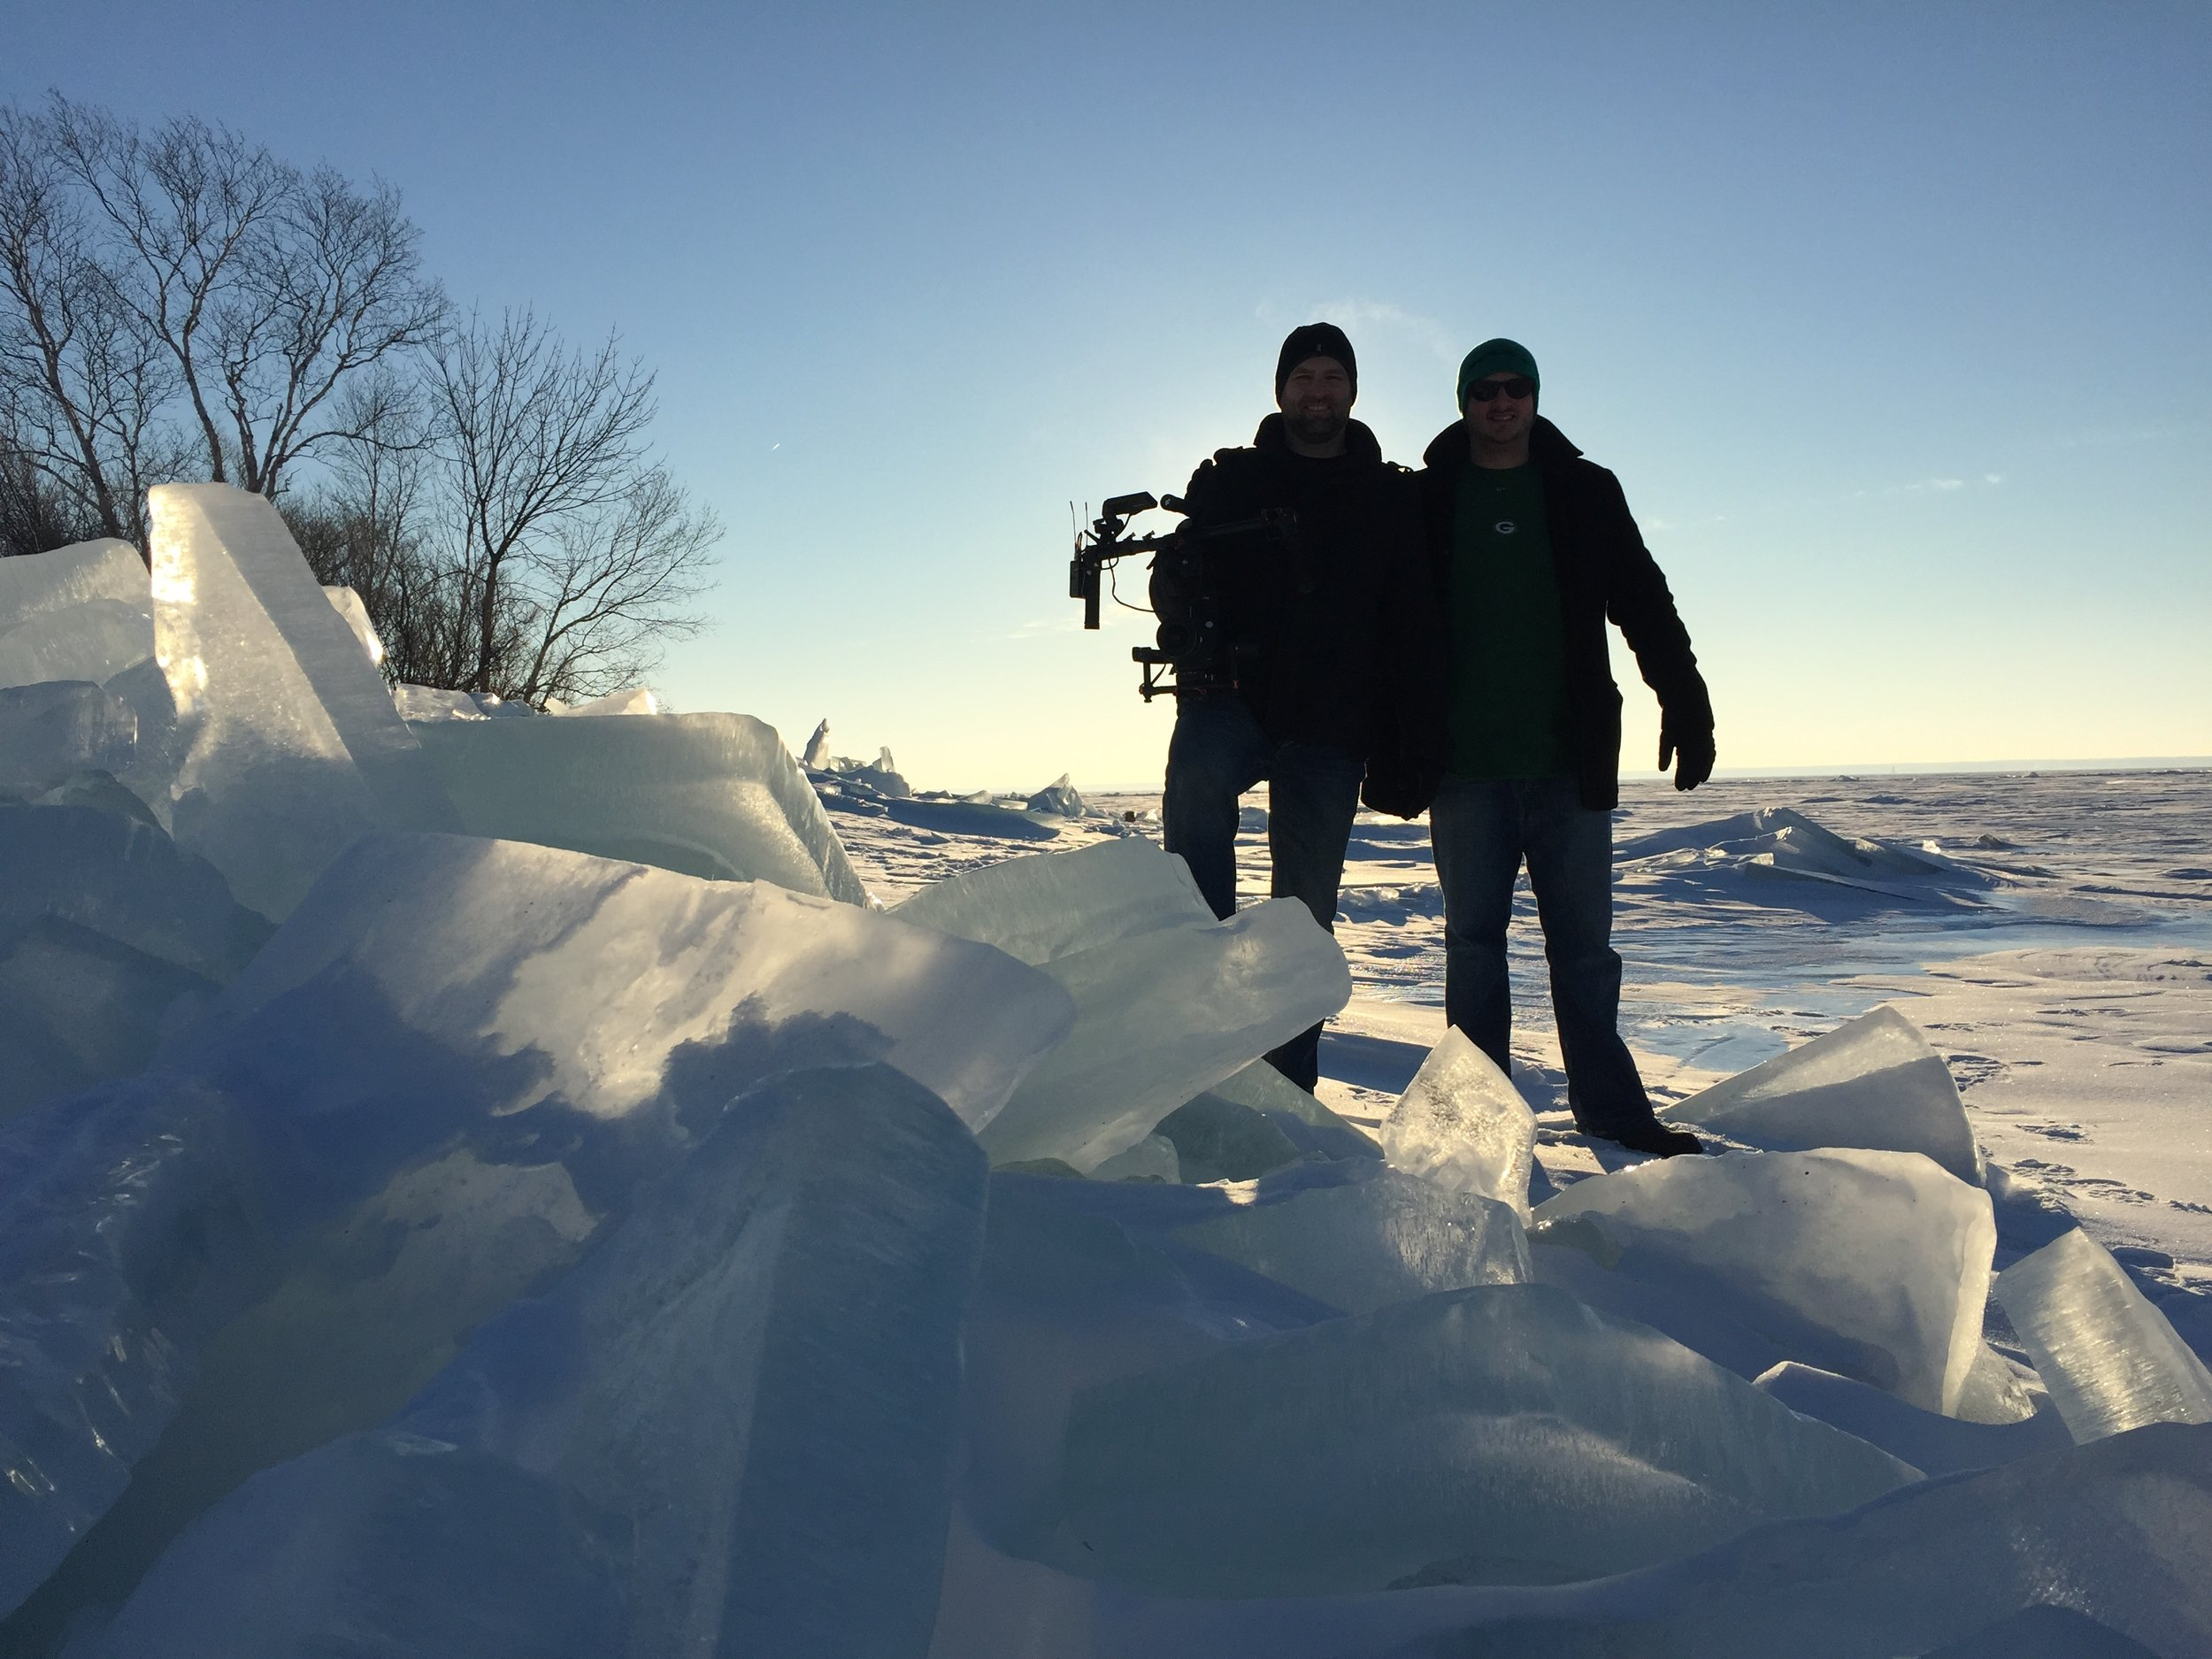 Filming on frozen Lake Superior for ESPN E:60.